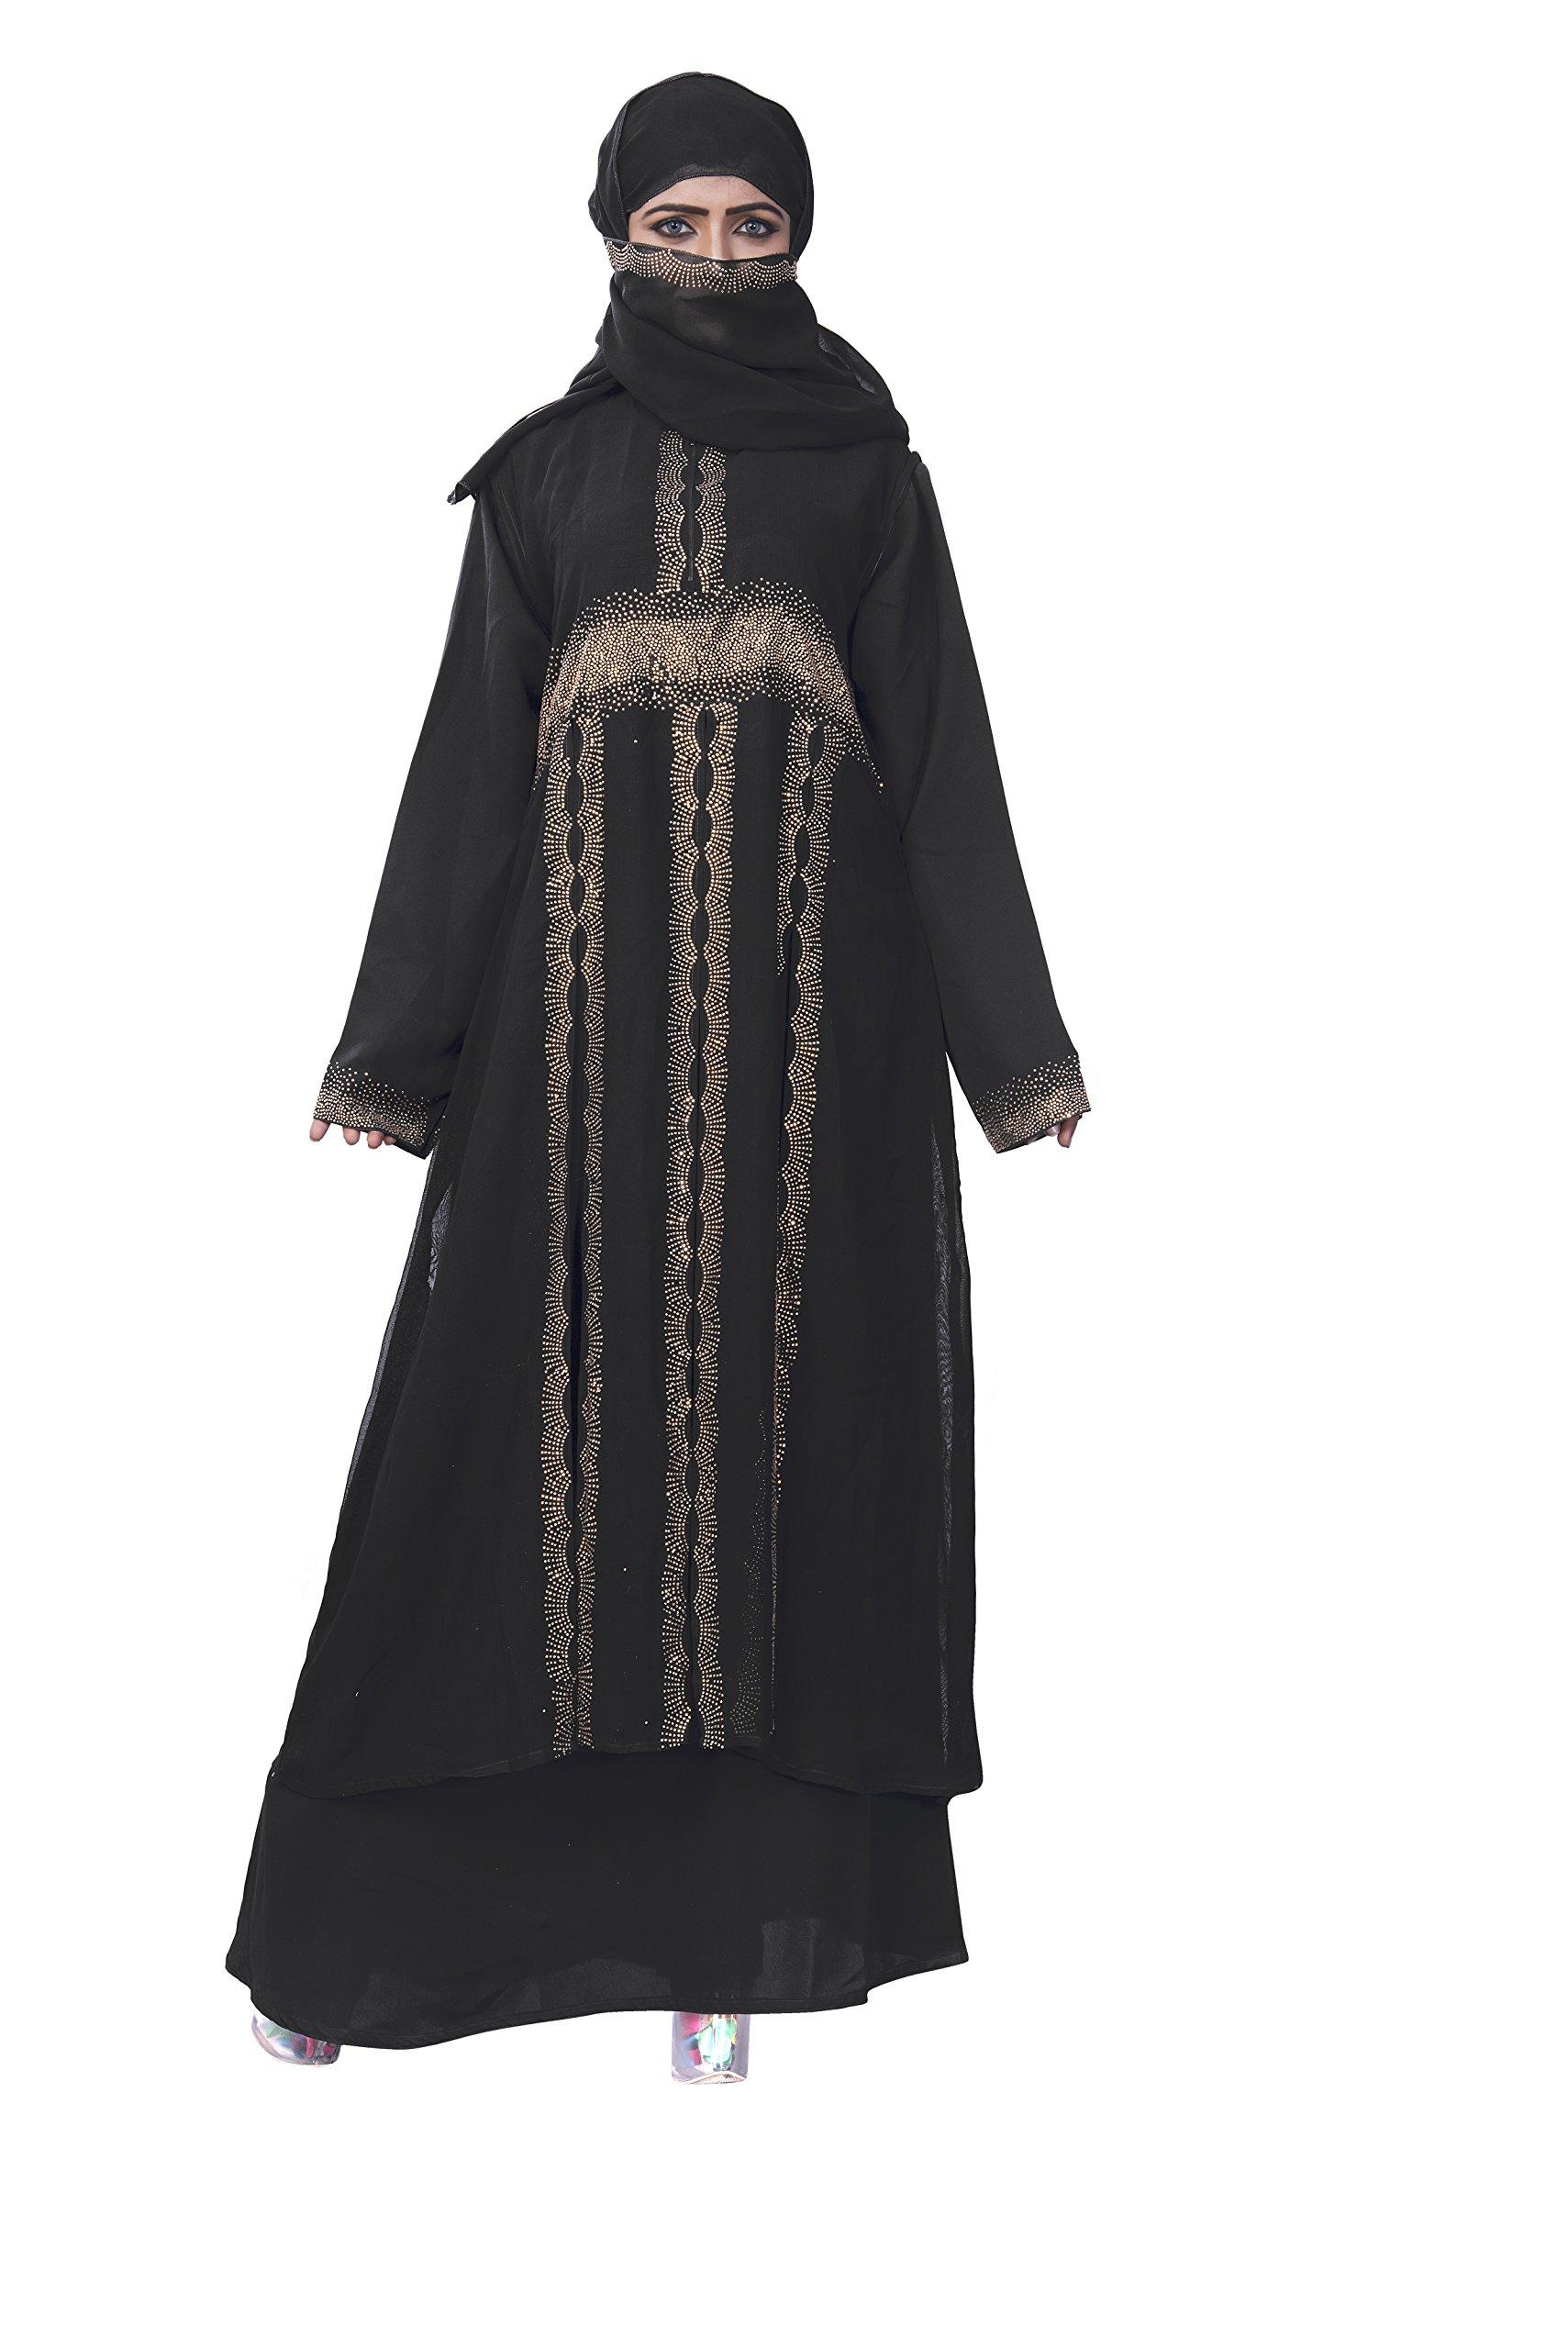 Women's Muslim Long Clothing Abaya Islamic Kaftan Burka Lady Cocktail Dress